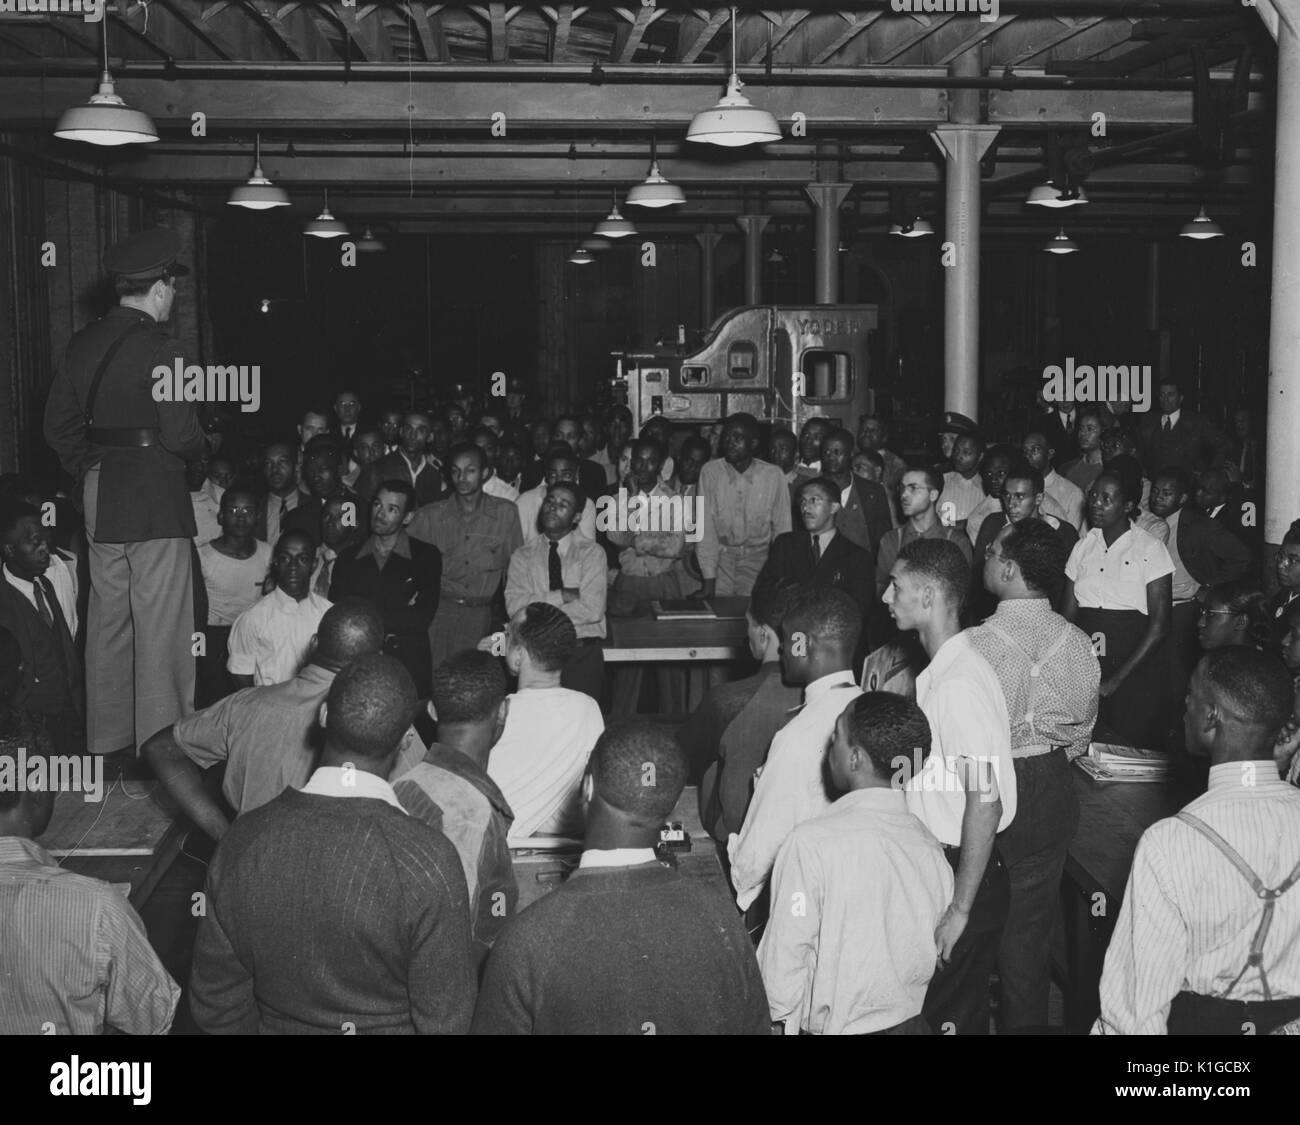 New York City 1940 Stock Photos Amp New York City 1940 Stock